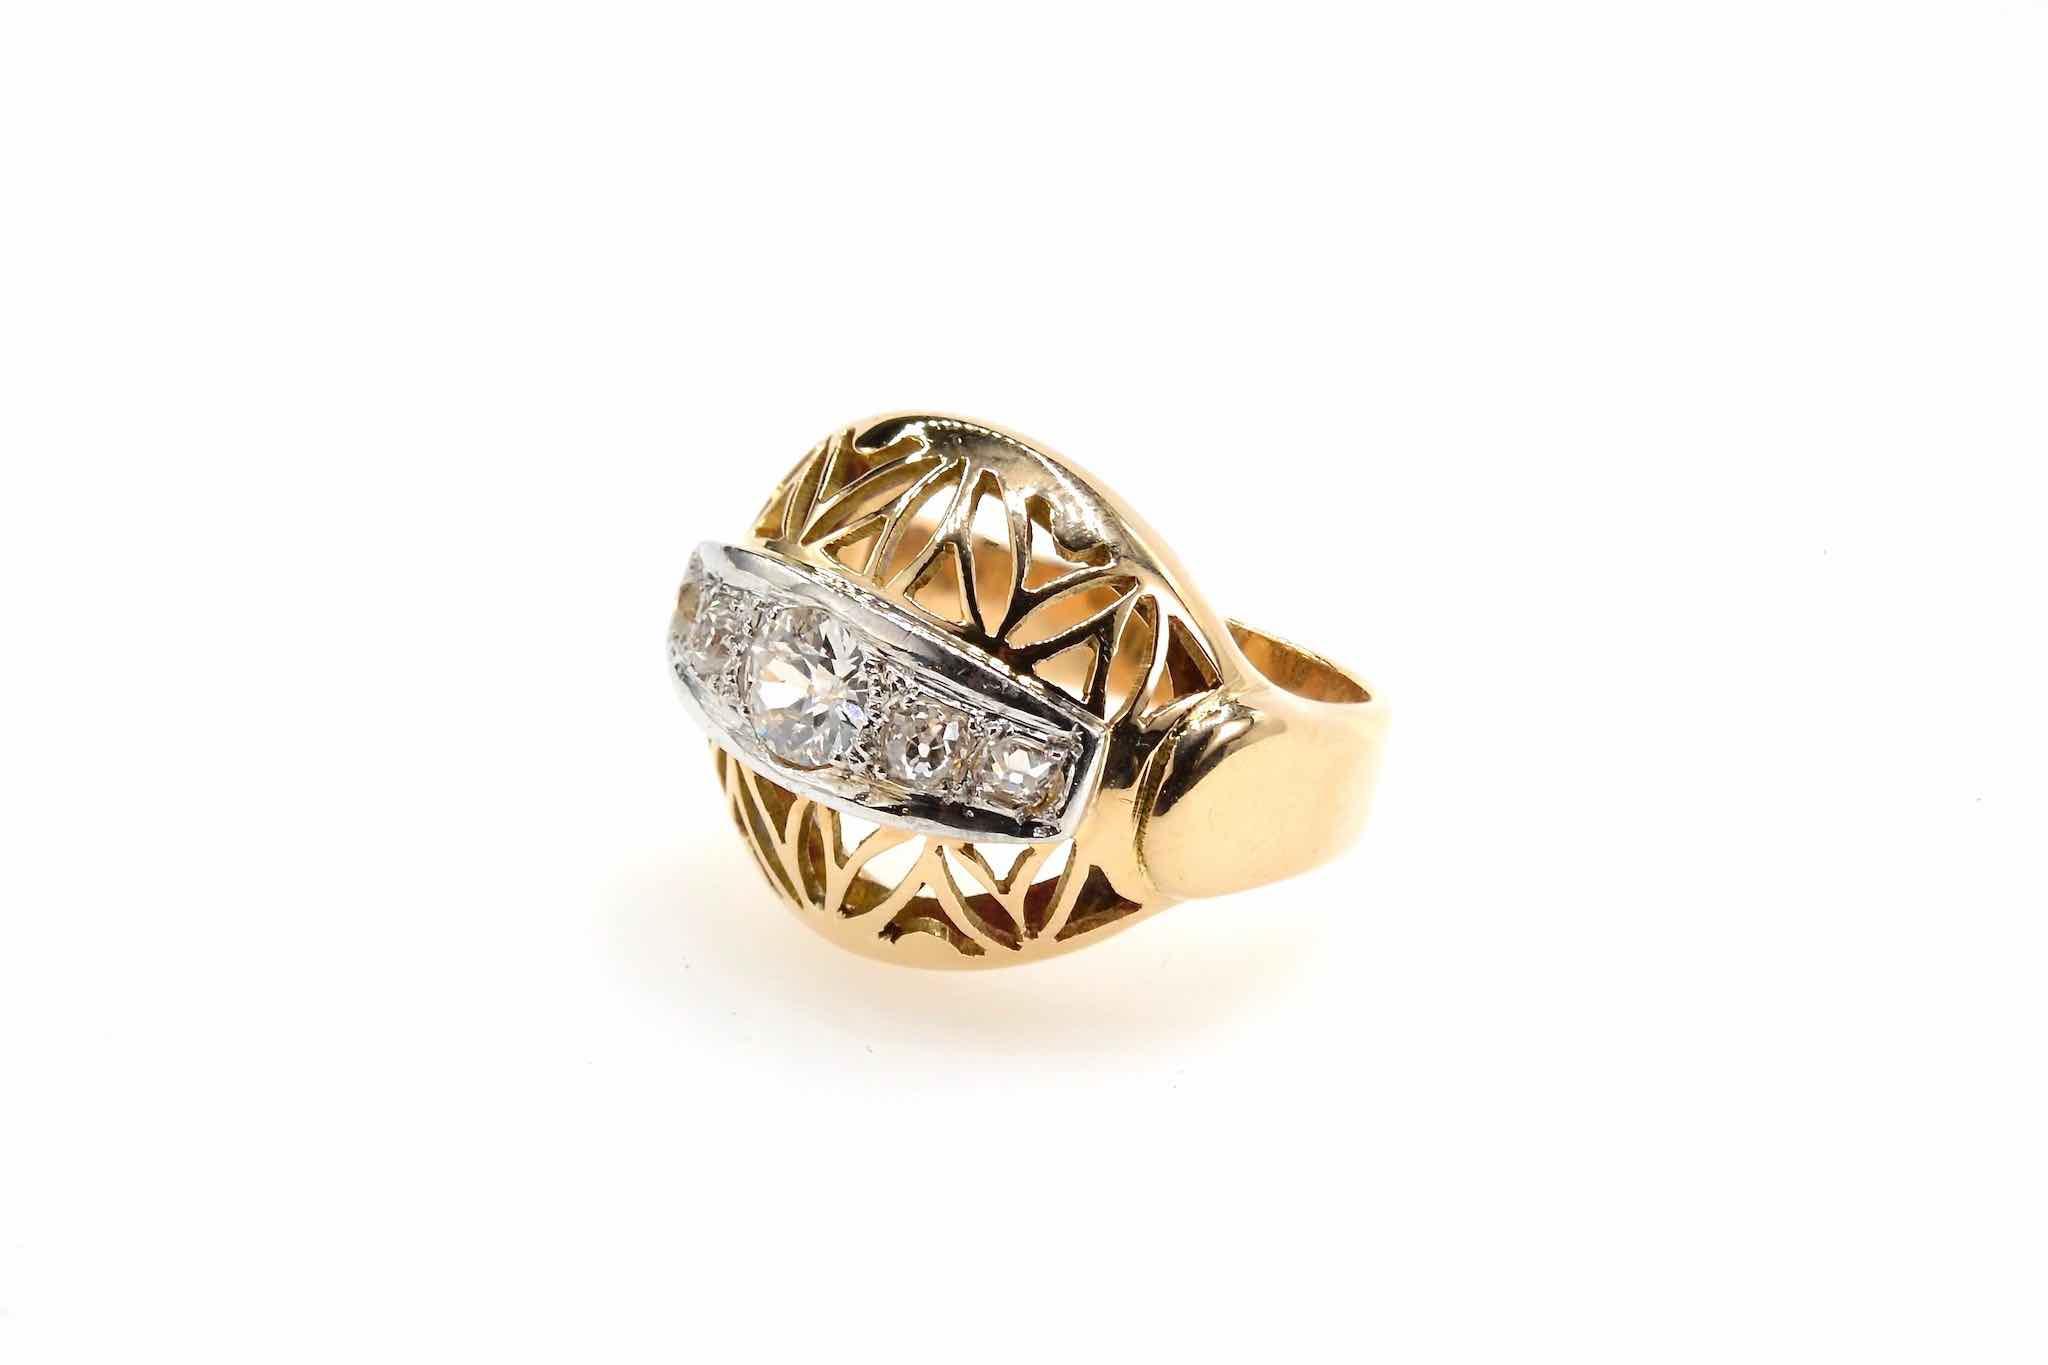 Bague dôme 1950 diamants en or jaune 18k